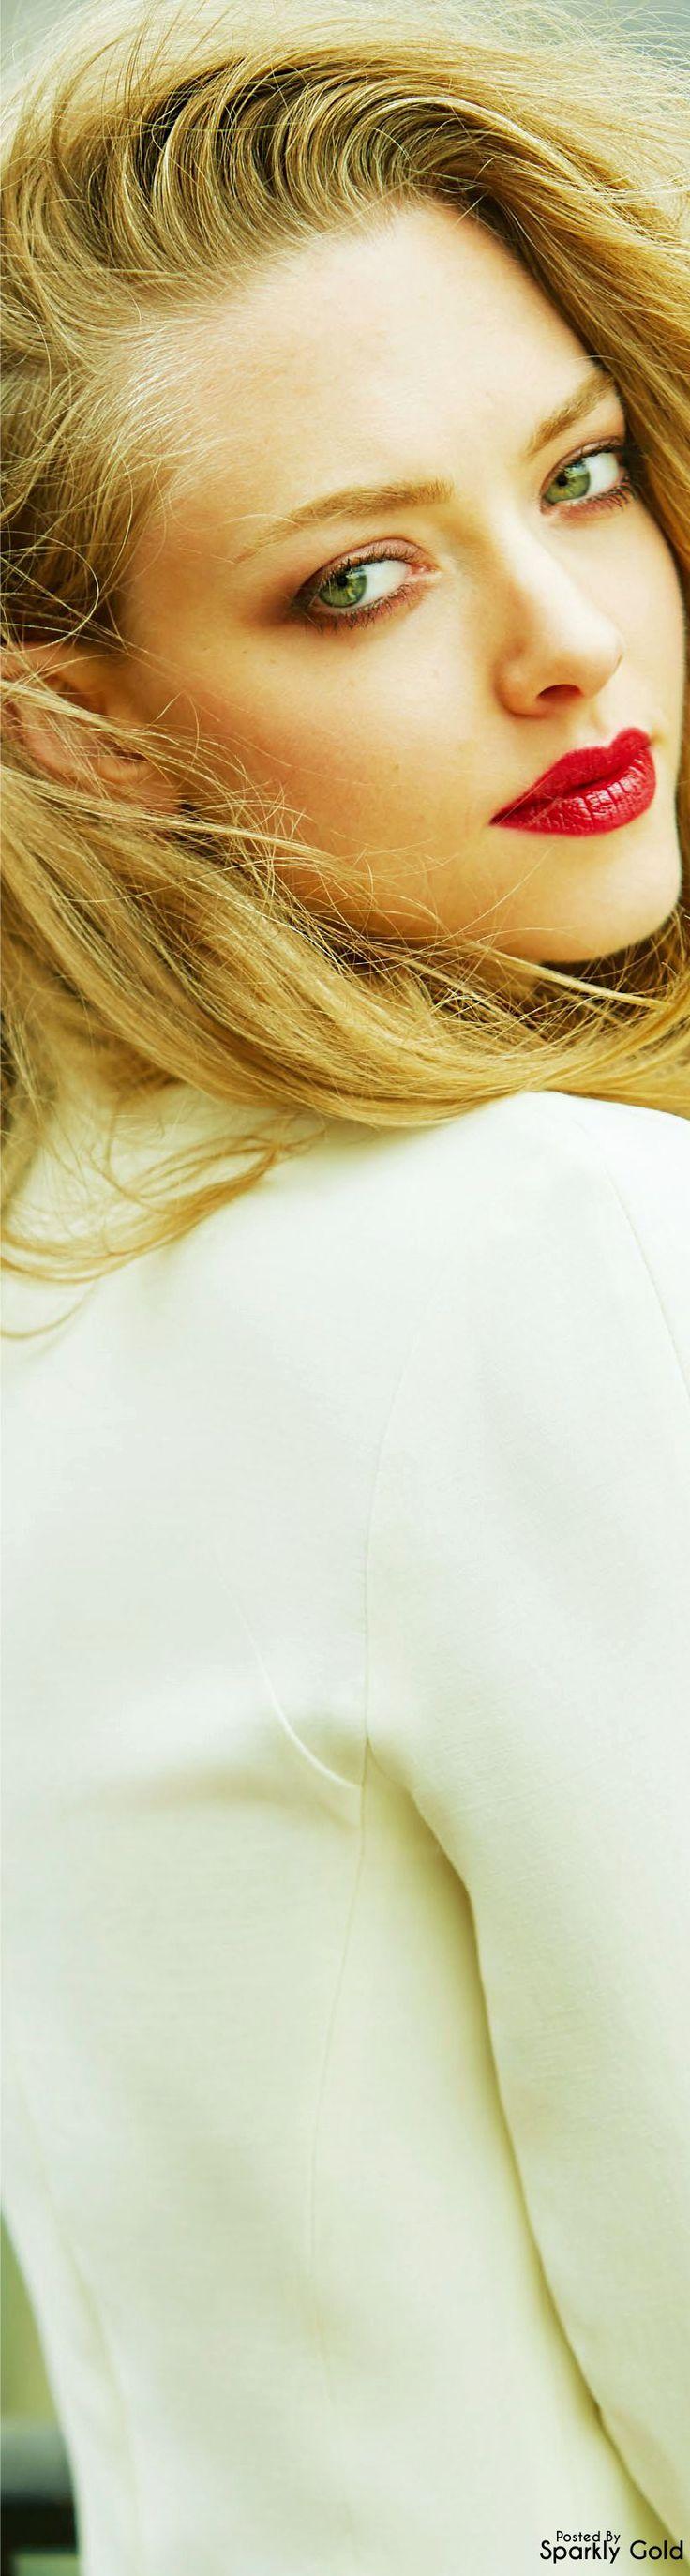 1000 images about Beautiful People on Pinterest Jessica. Amanda Seyfried Elle China Sep 16